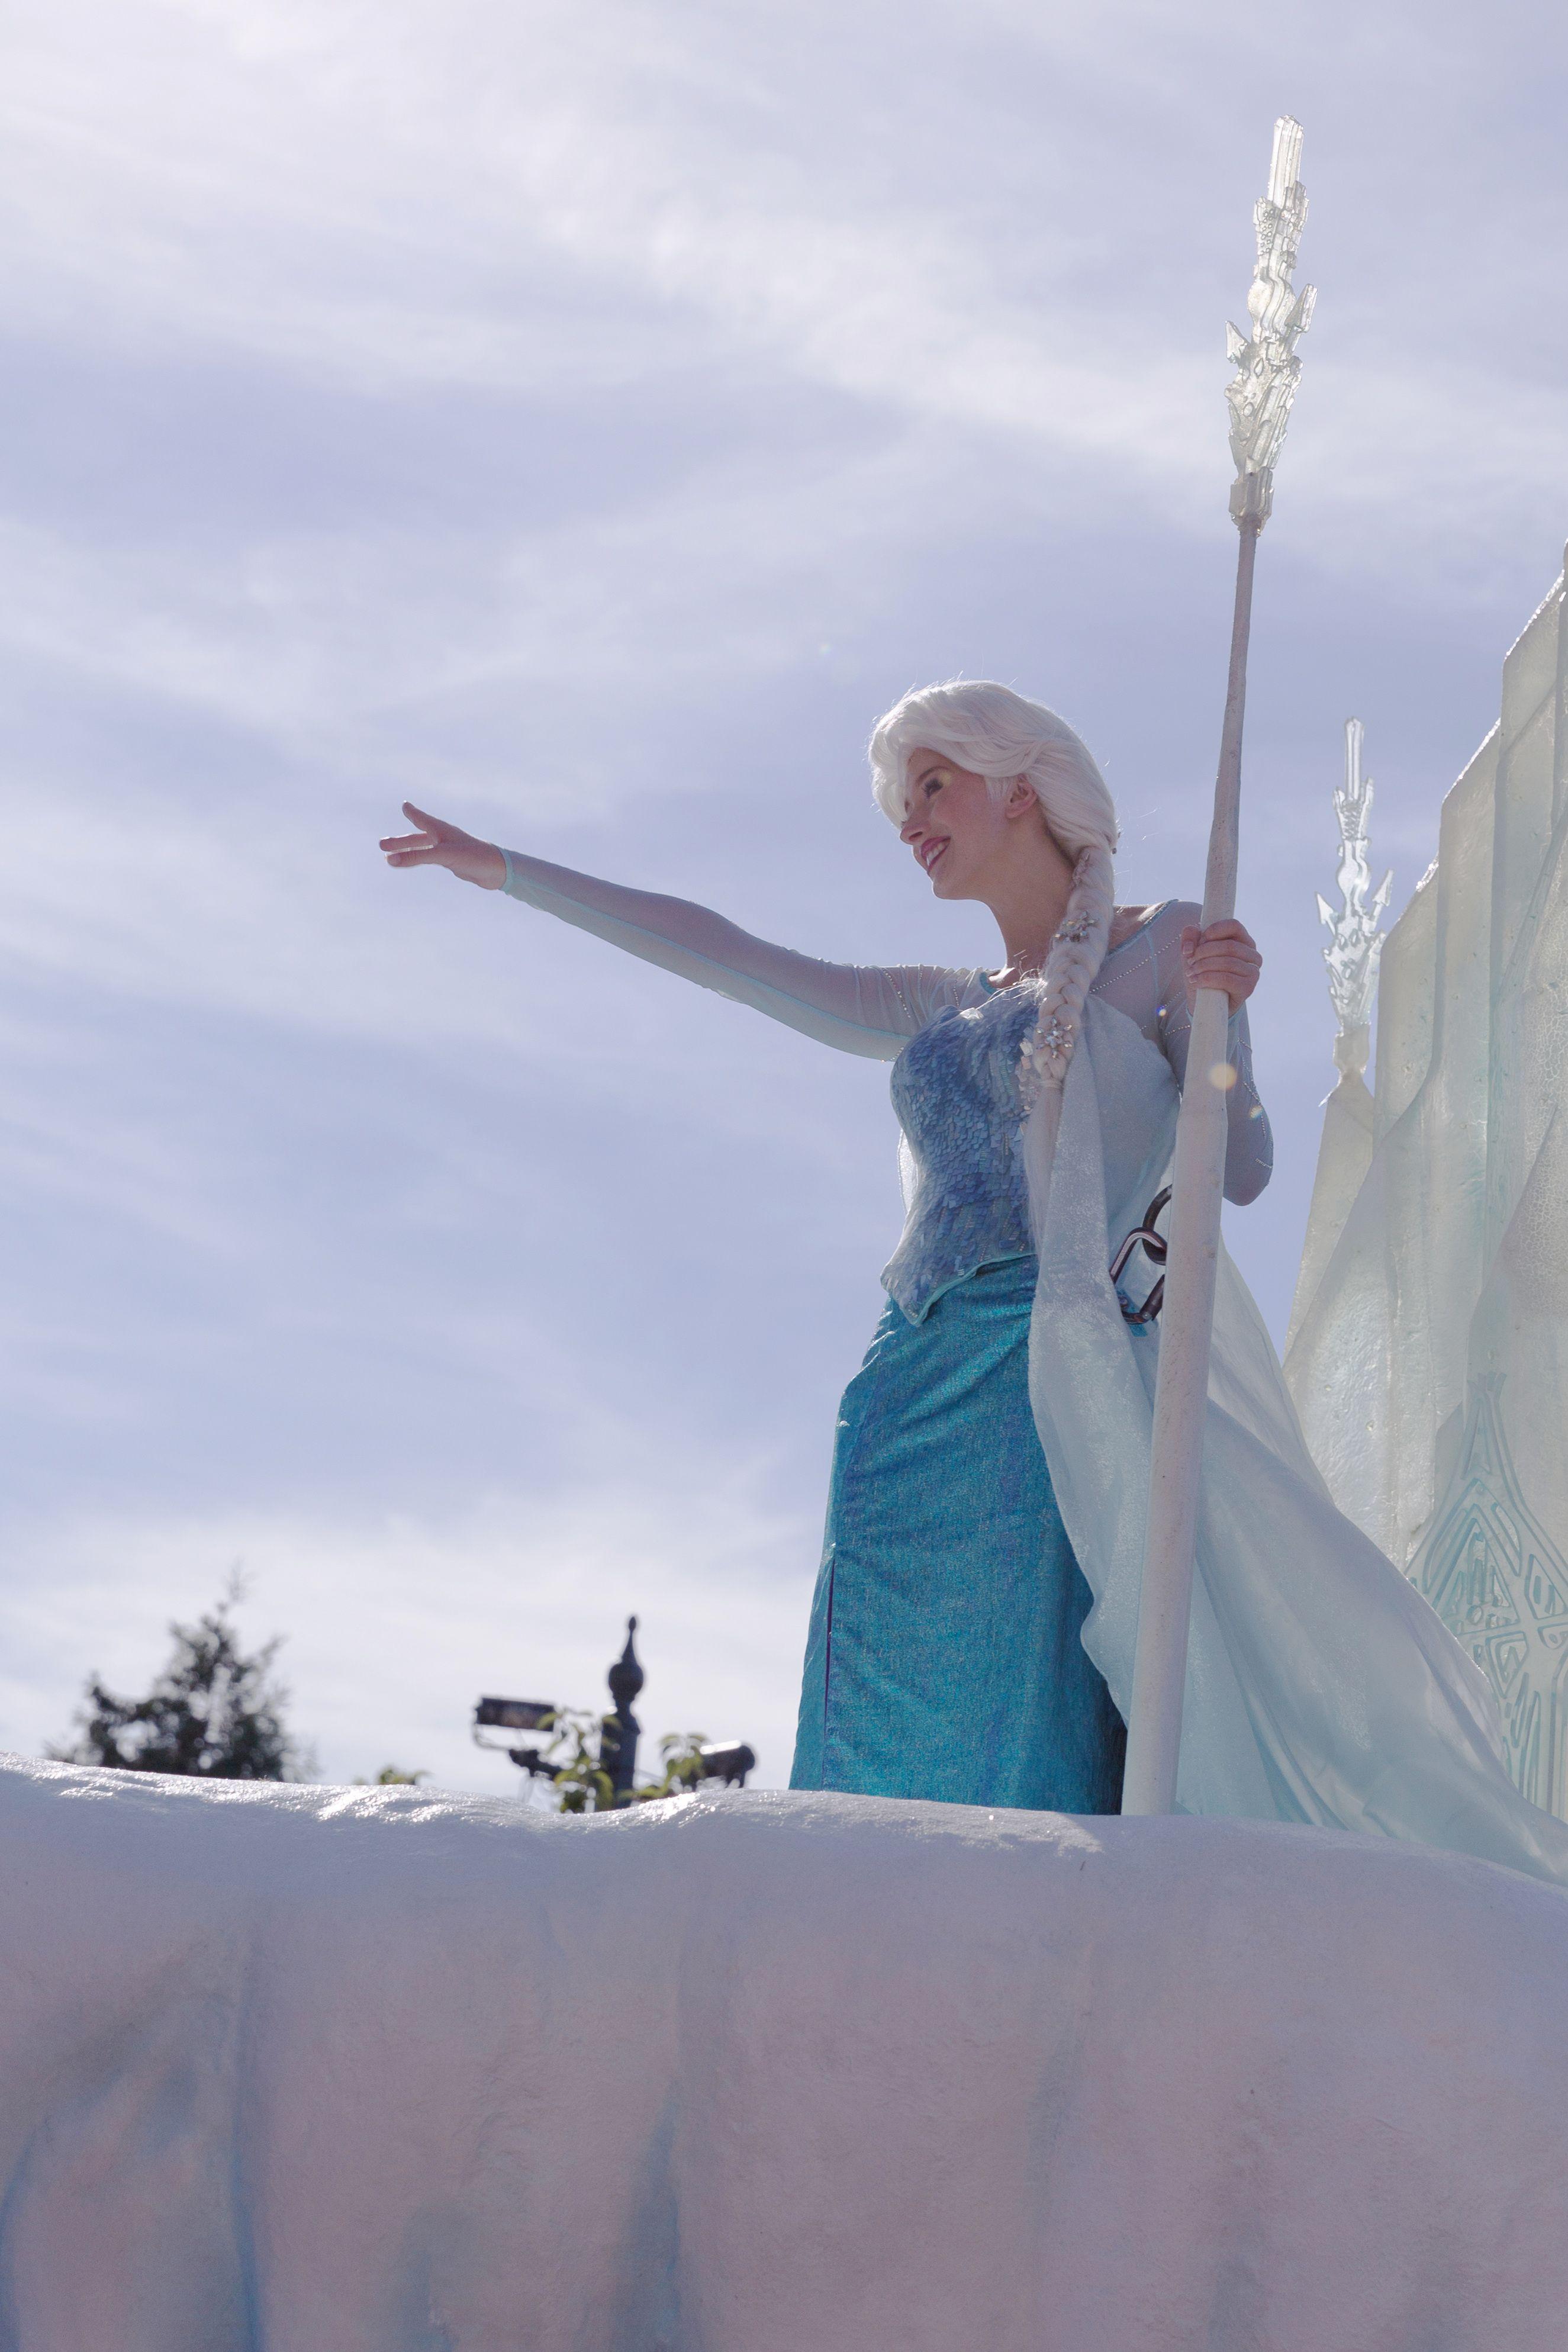 Frozen Summer Fun at Disneyland Paris Disney Magic on Parade